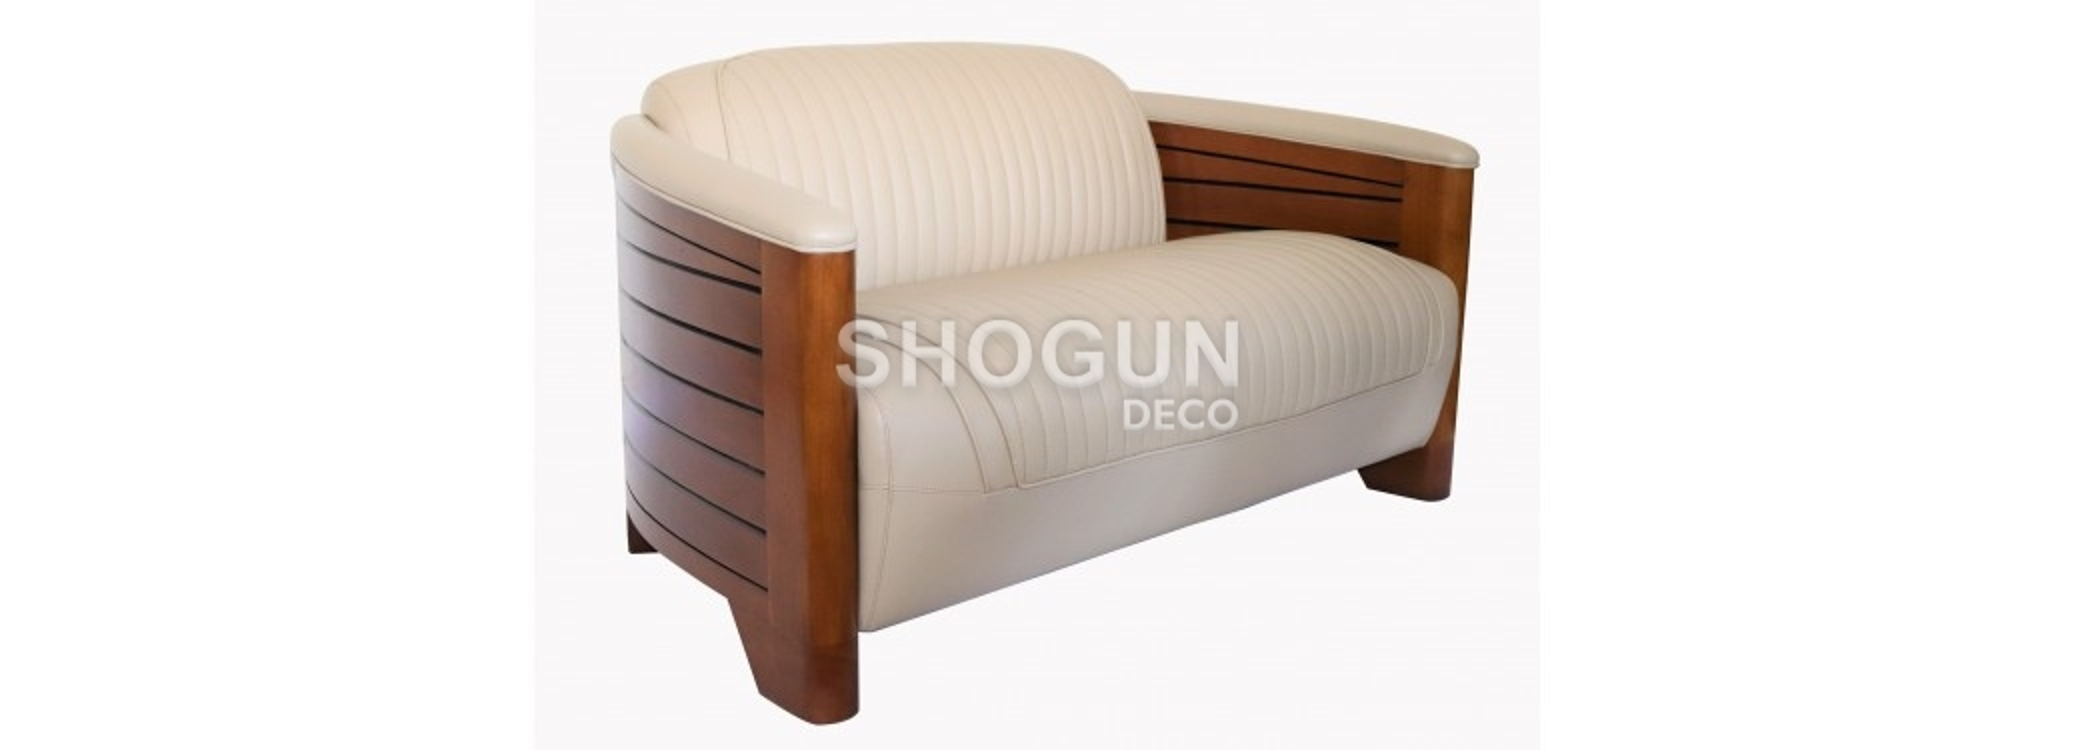 Pirogue sofa - Beige leather